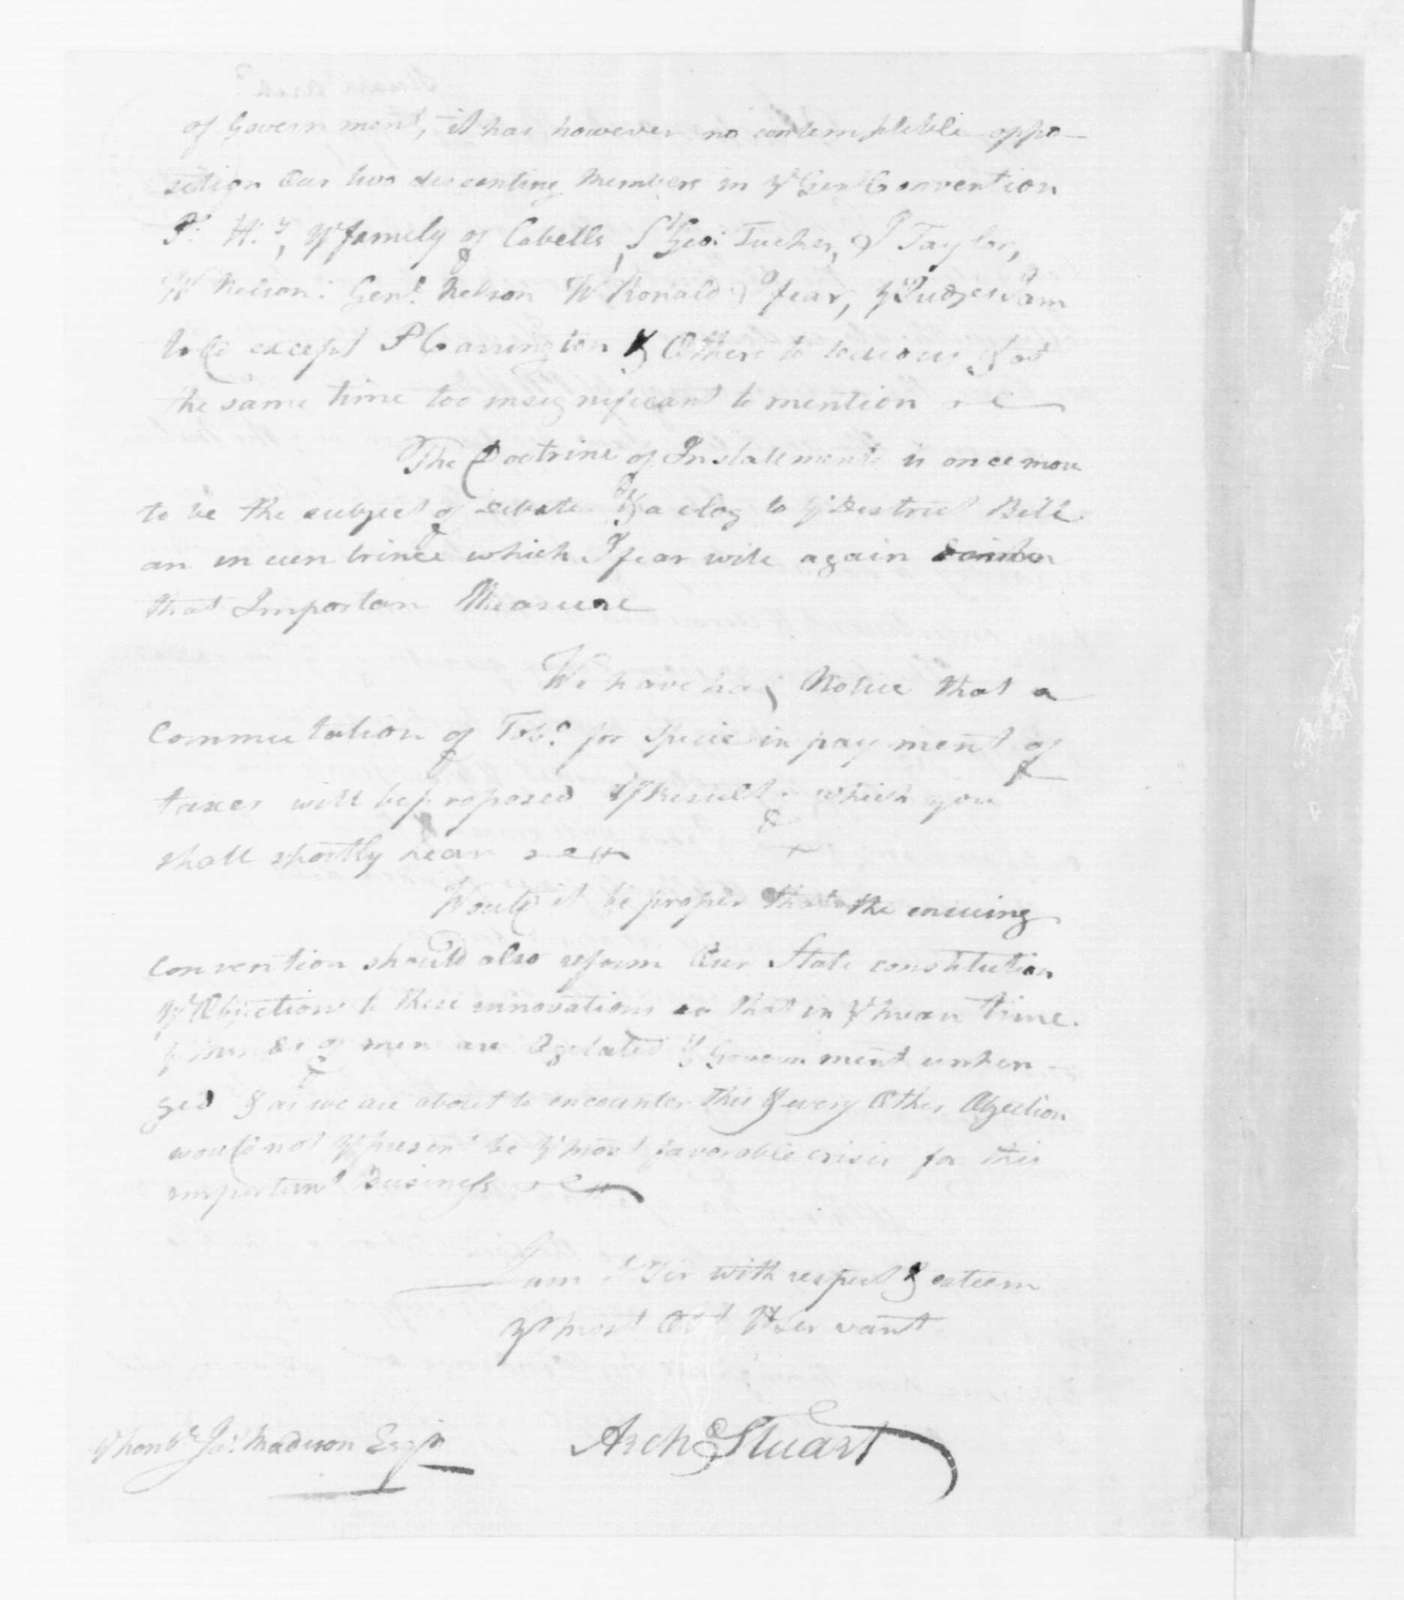 Archibald Stuart to James Madison, October 21, 1787.